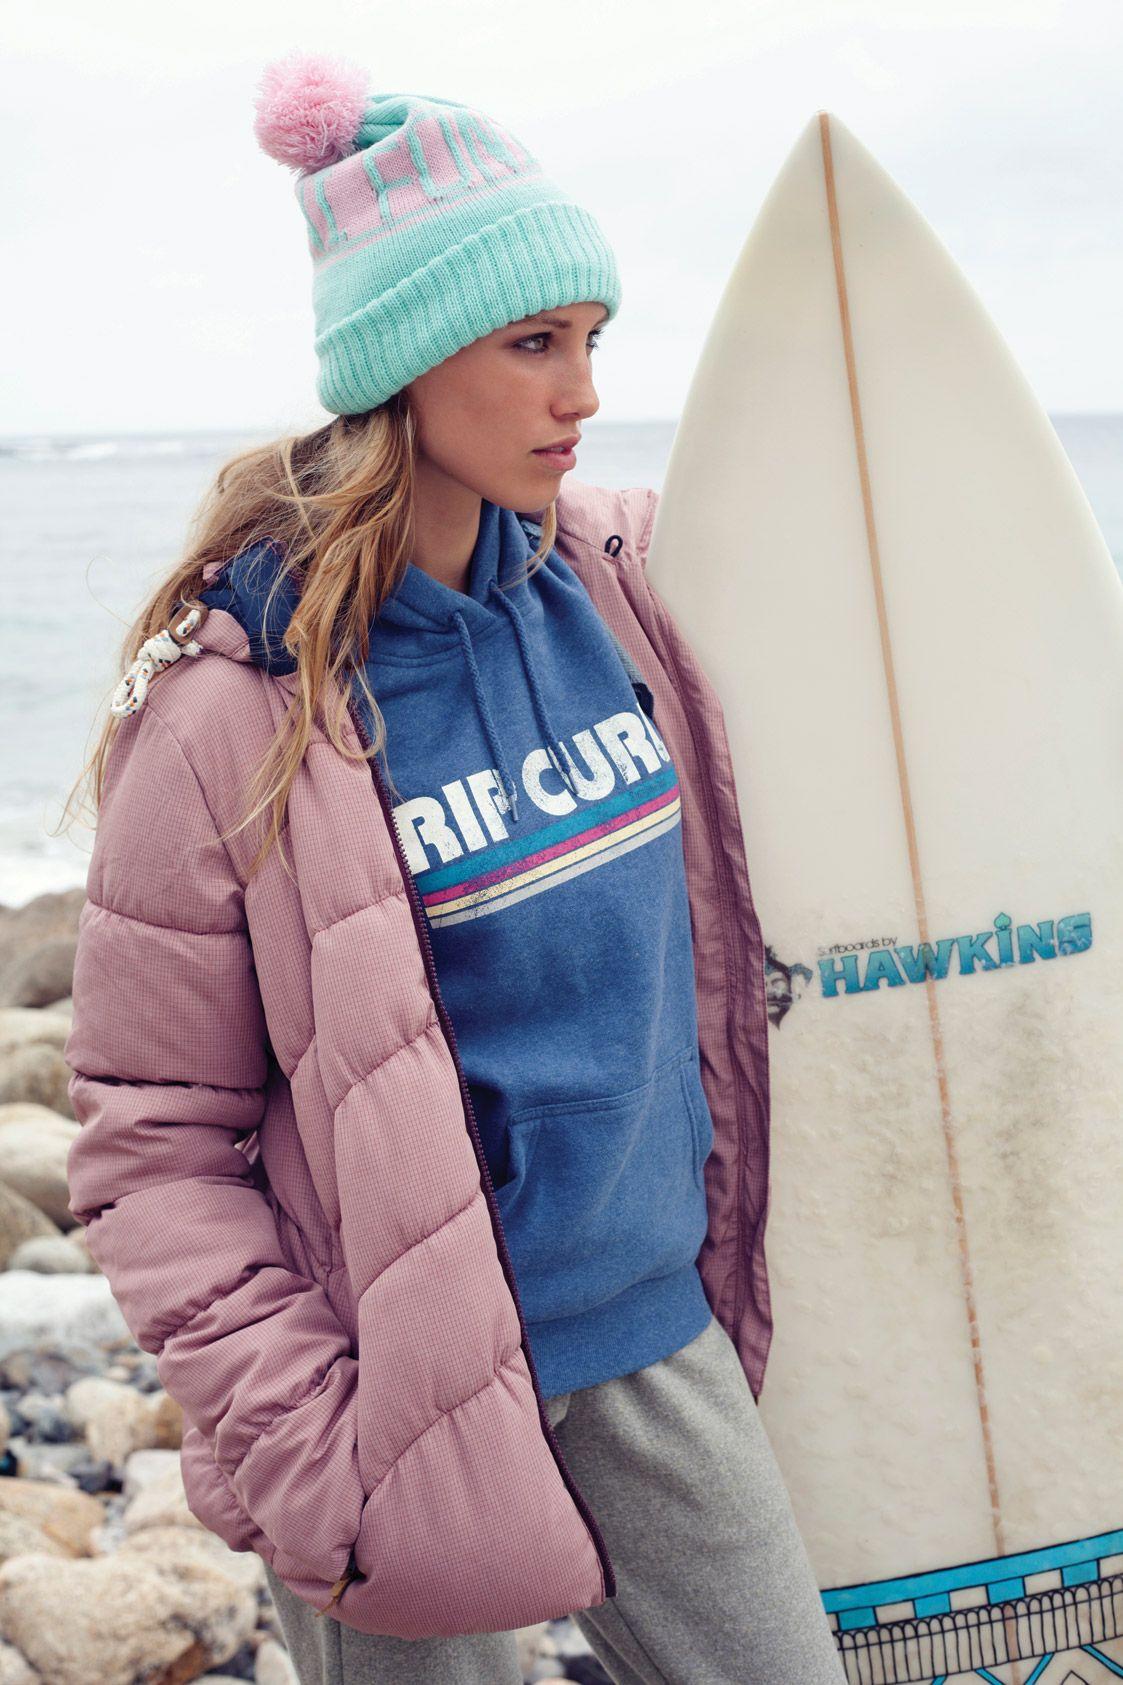 lowenna for surf girl mag 6 style pinterest surf girls and surfer girl style. Black Bedroom Furniture Sets. Home Design Ideas